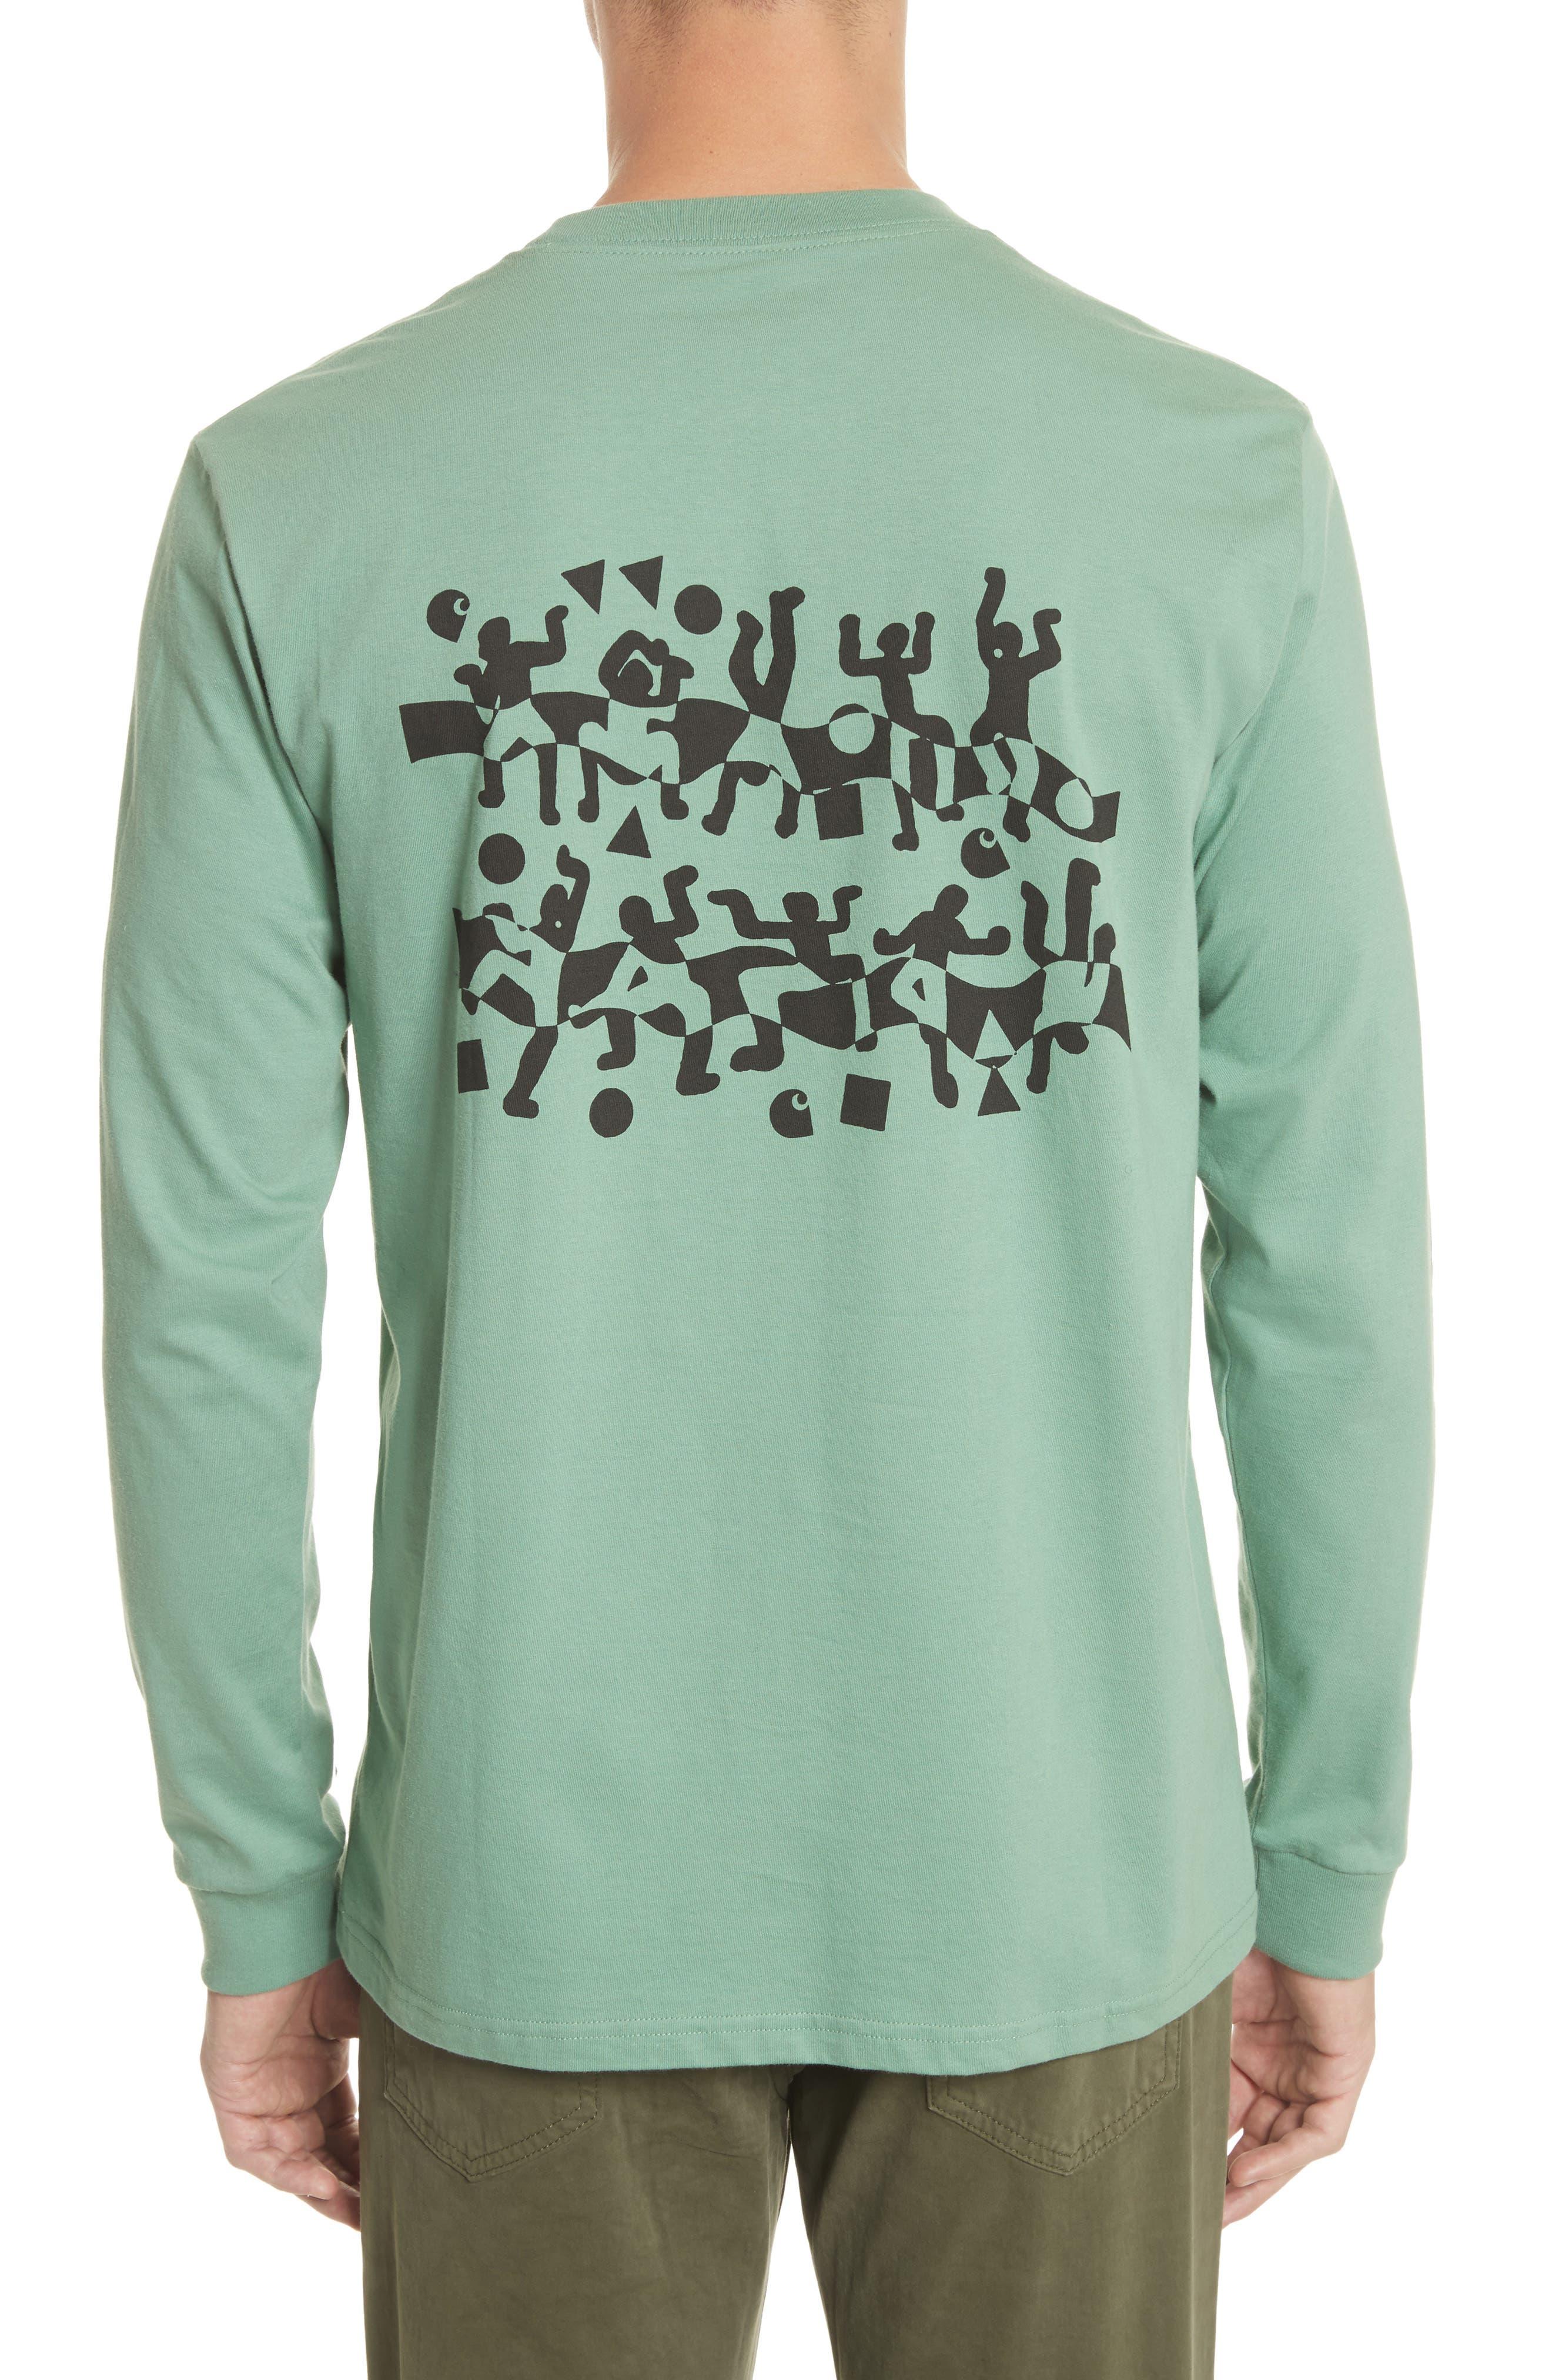 World Party T-Shirt,                             Alternate thumbnail 2, color,                             Catnip/Black